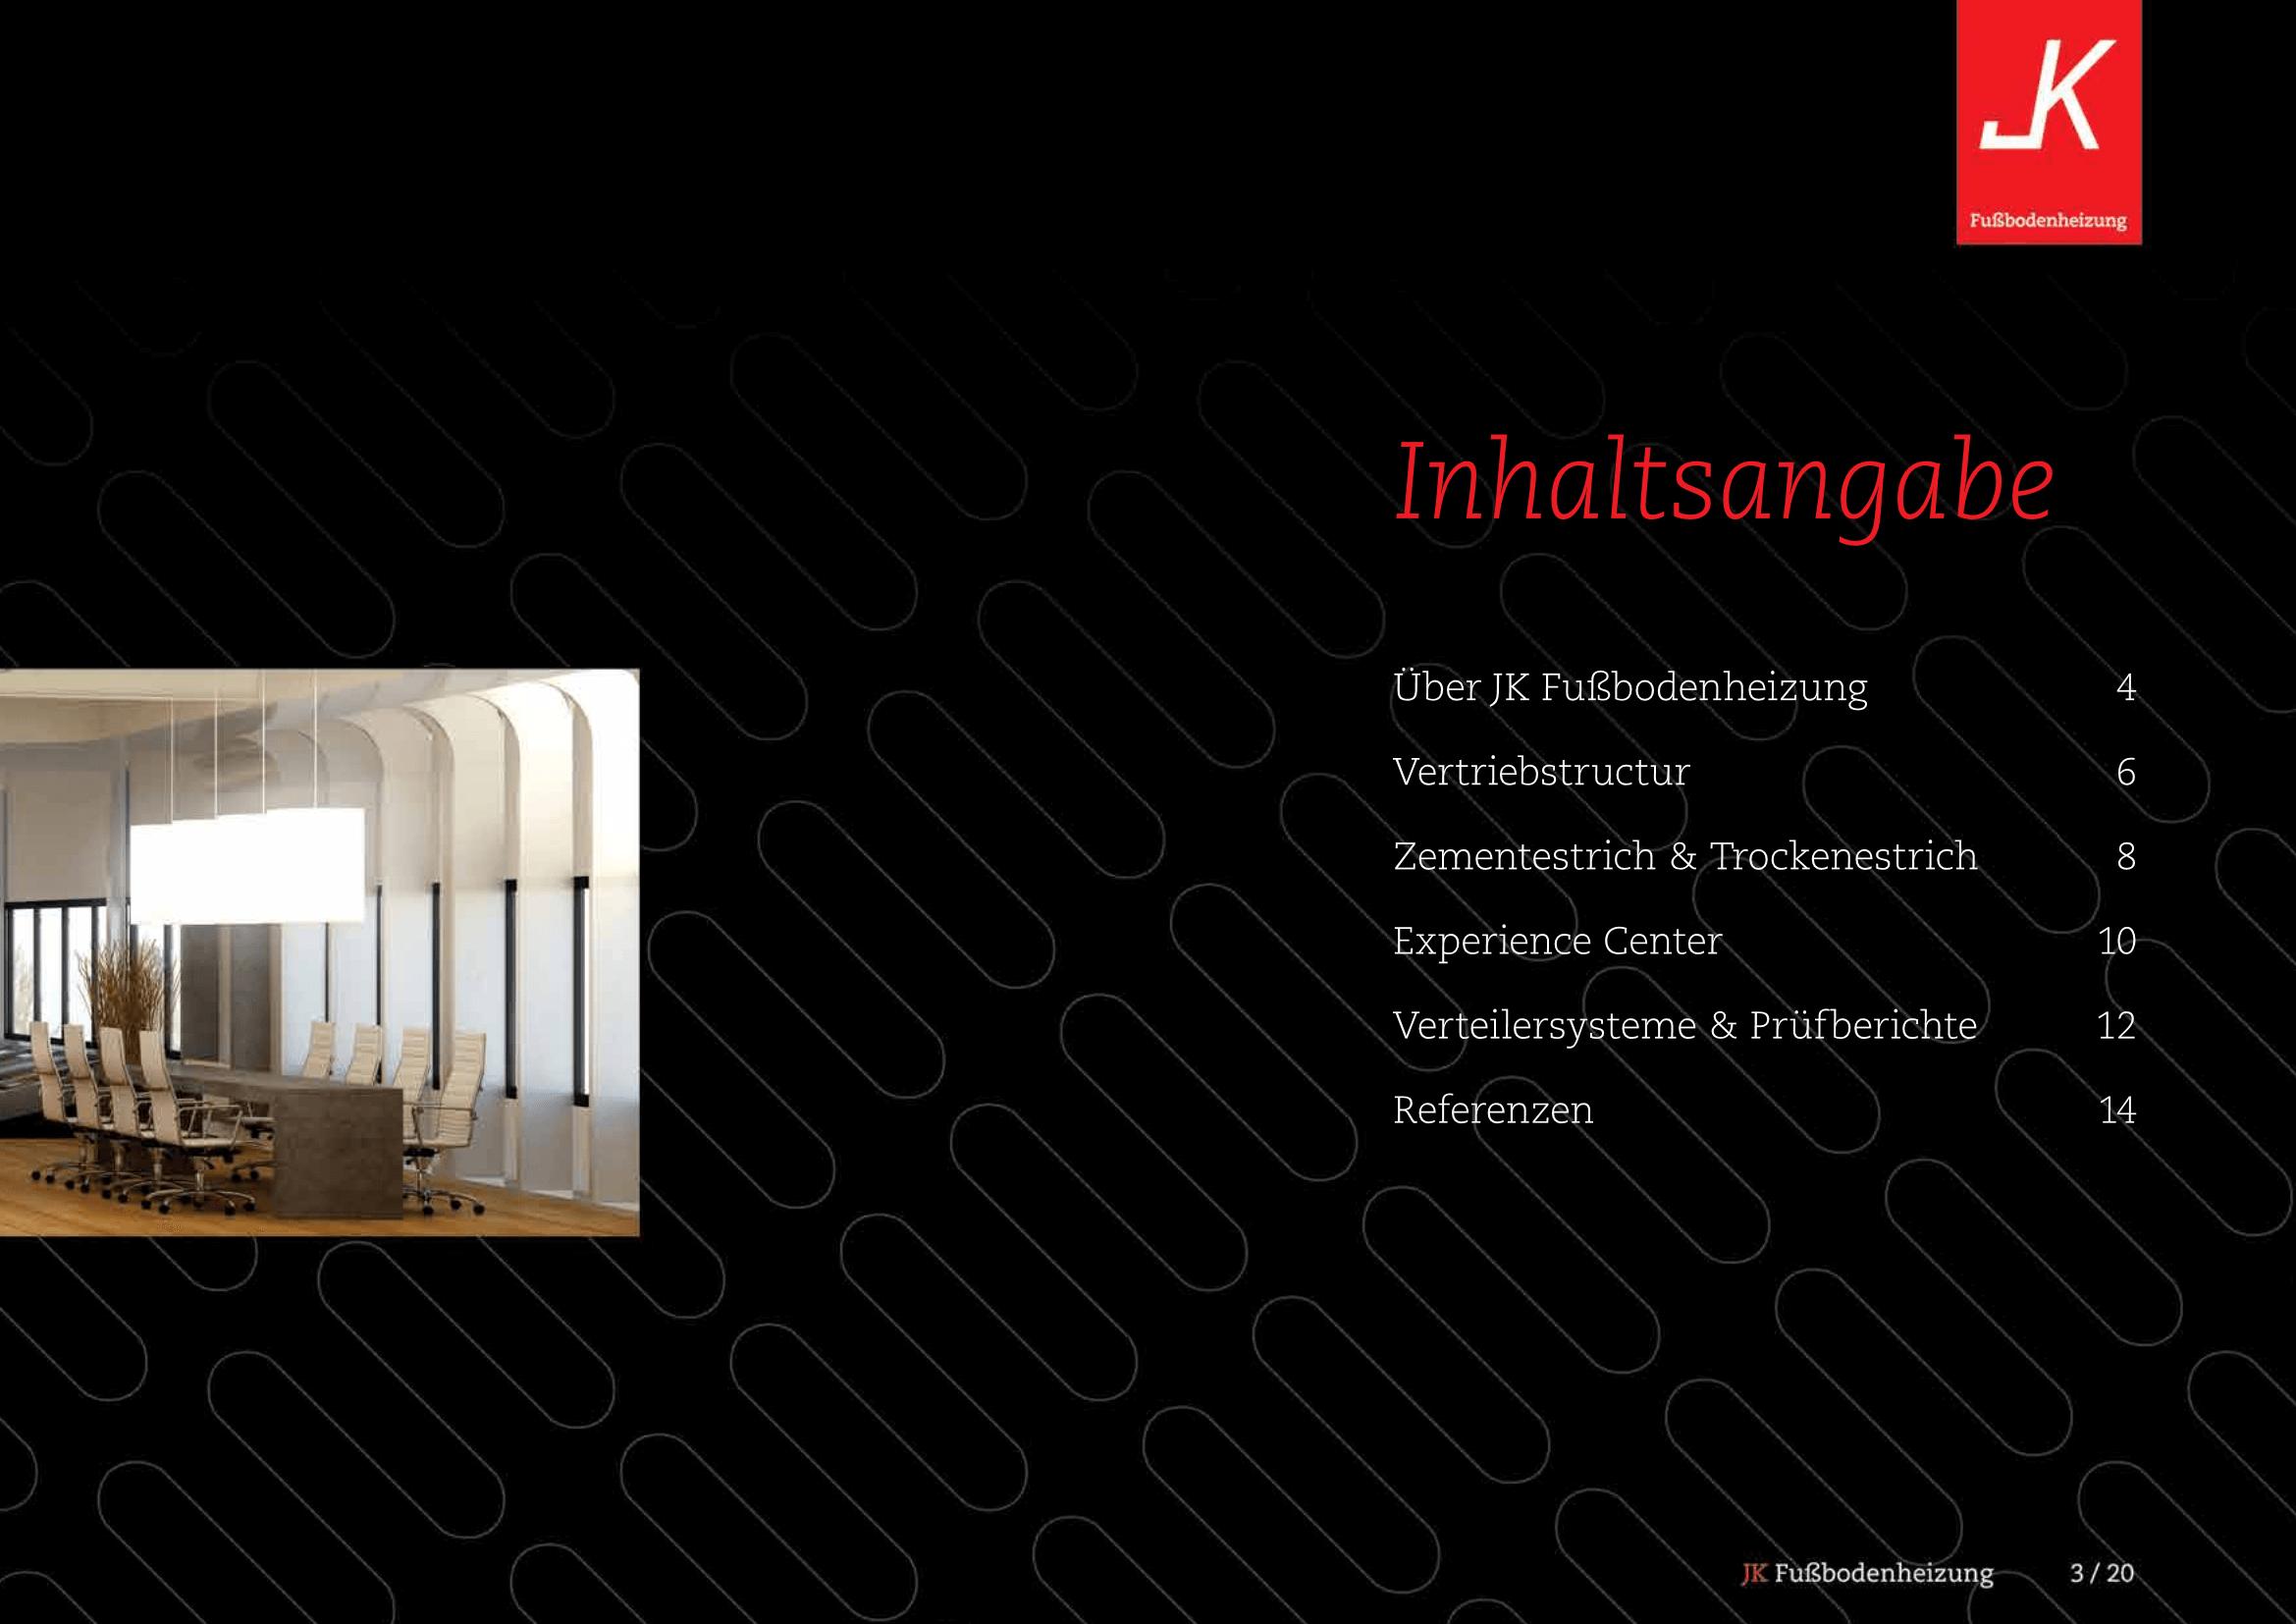 https://www.bonntech.de/wp-content/uploads/2018/02/JK-Beursbrochure-2016-Web_Page_3.png